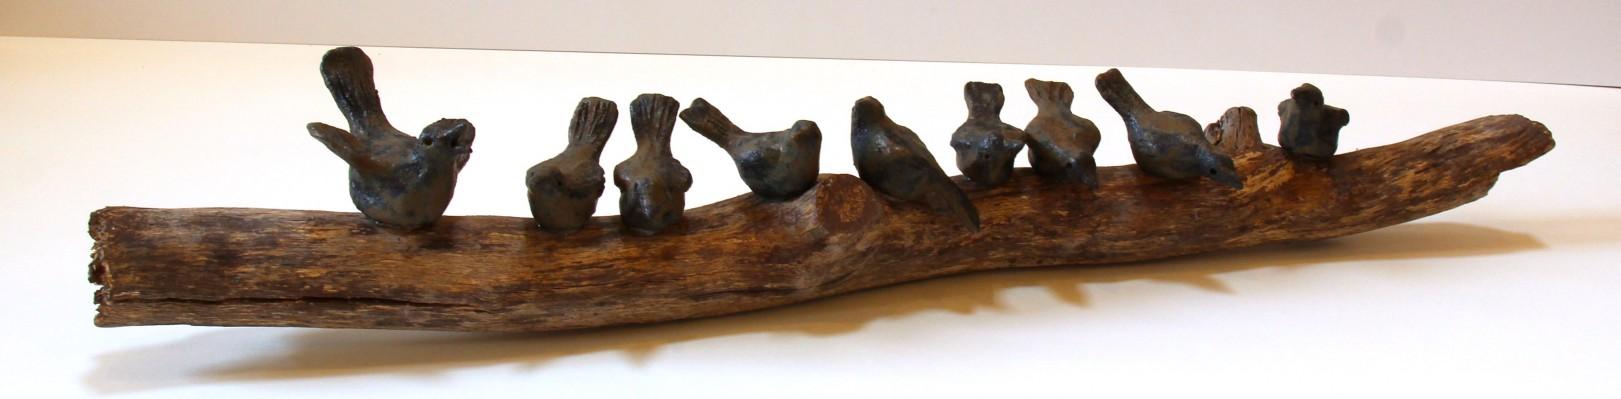 Jane Adams_Original_Ceramic on Driftwood_A Flying Lesson_32x6x6 (2)